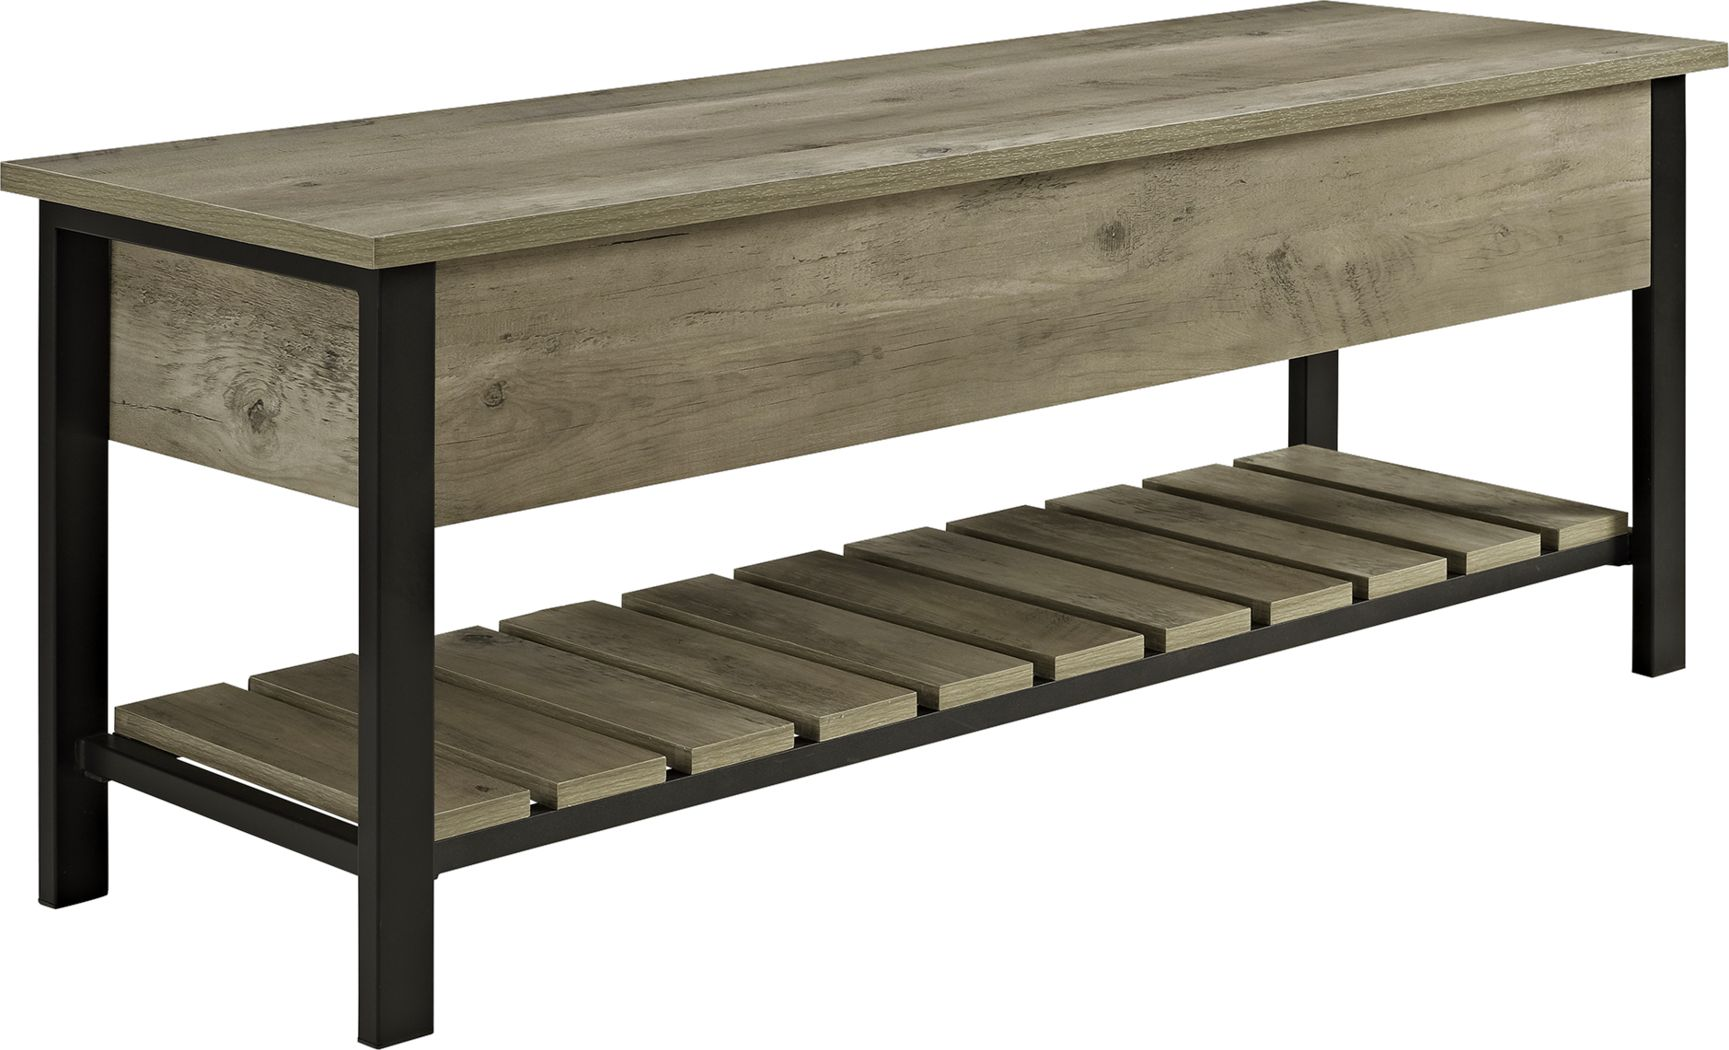 Commer Gray Bench